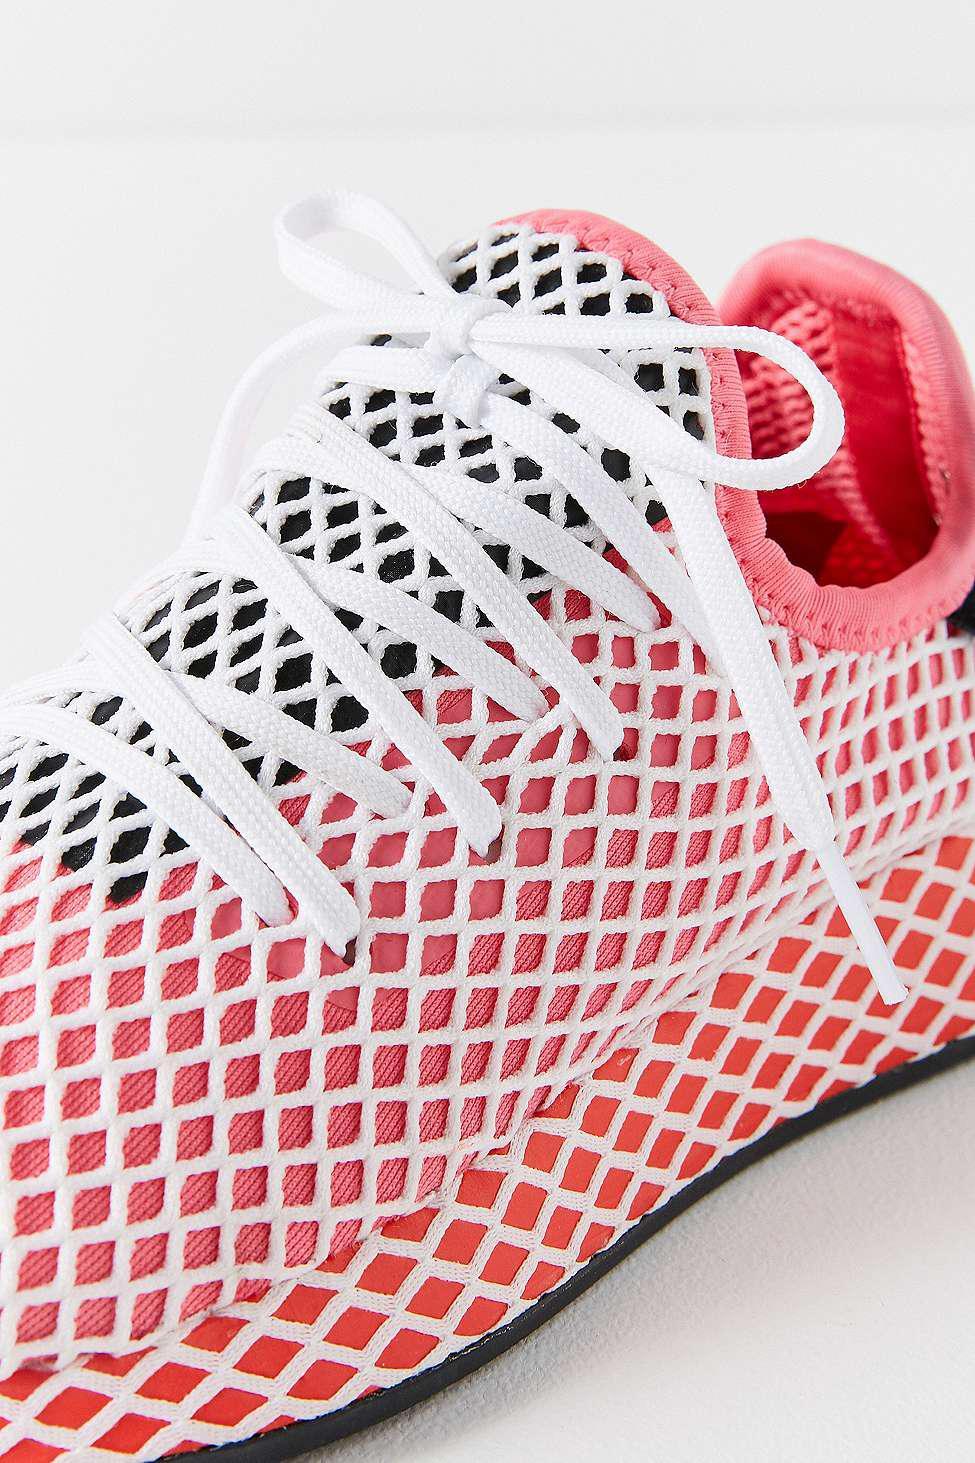 053b684fa1c8c adidas Originals Deerupt Pink And Red Running Trainers - Womens Uk 6 ...